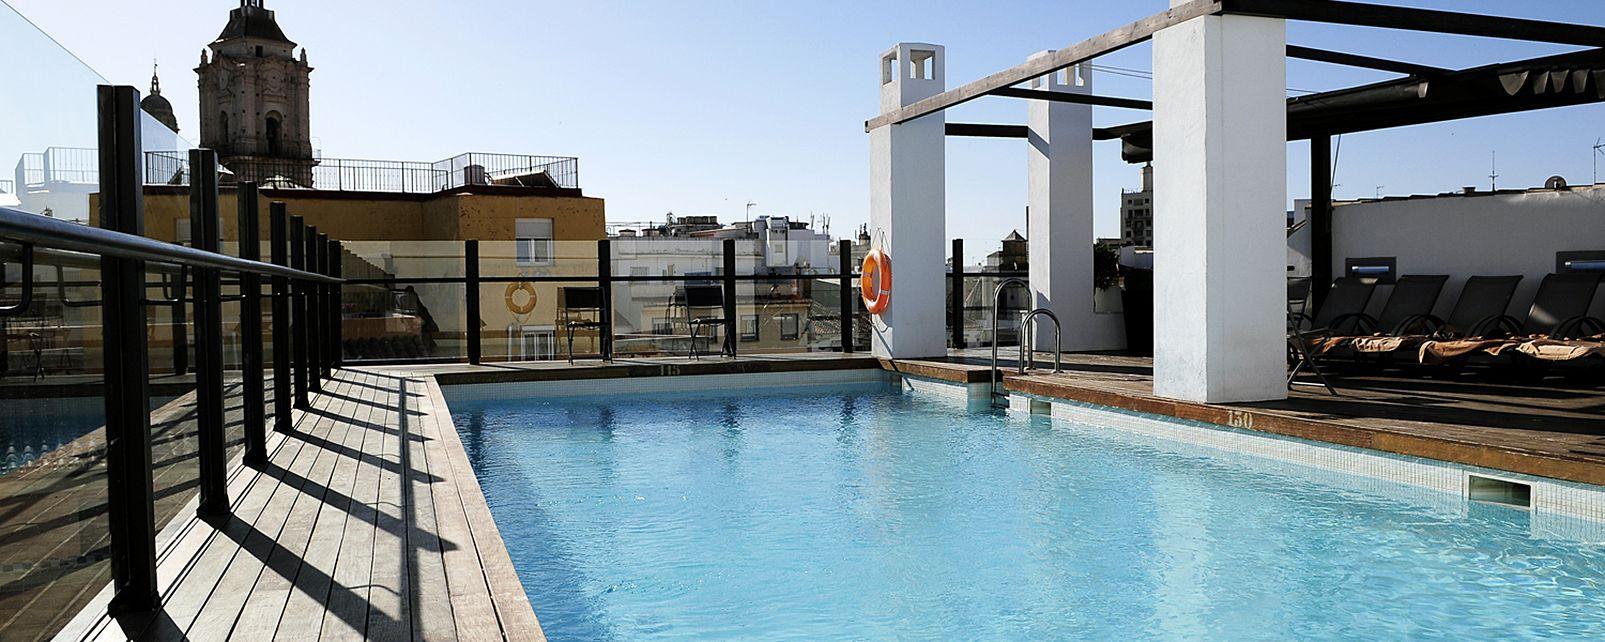 Thb Vincci Selecci 243 N Posada Del Patio Hotel In M 225 Laga